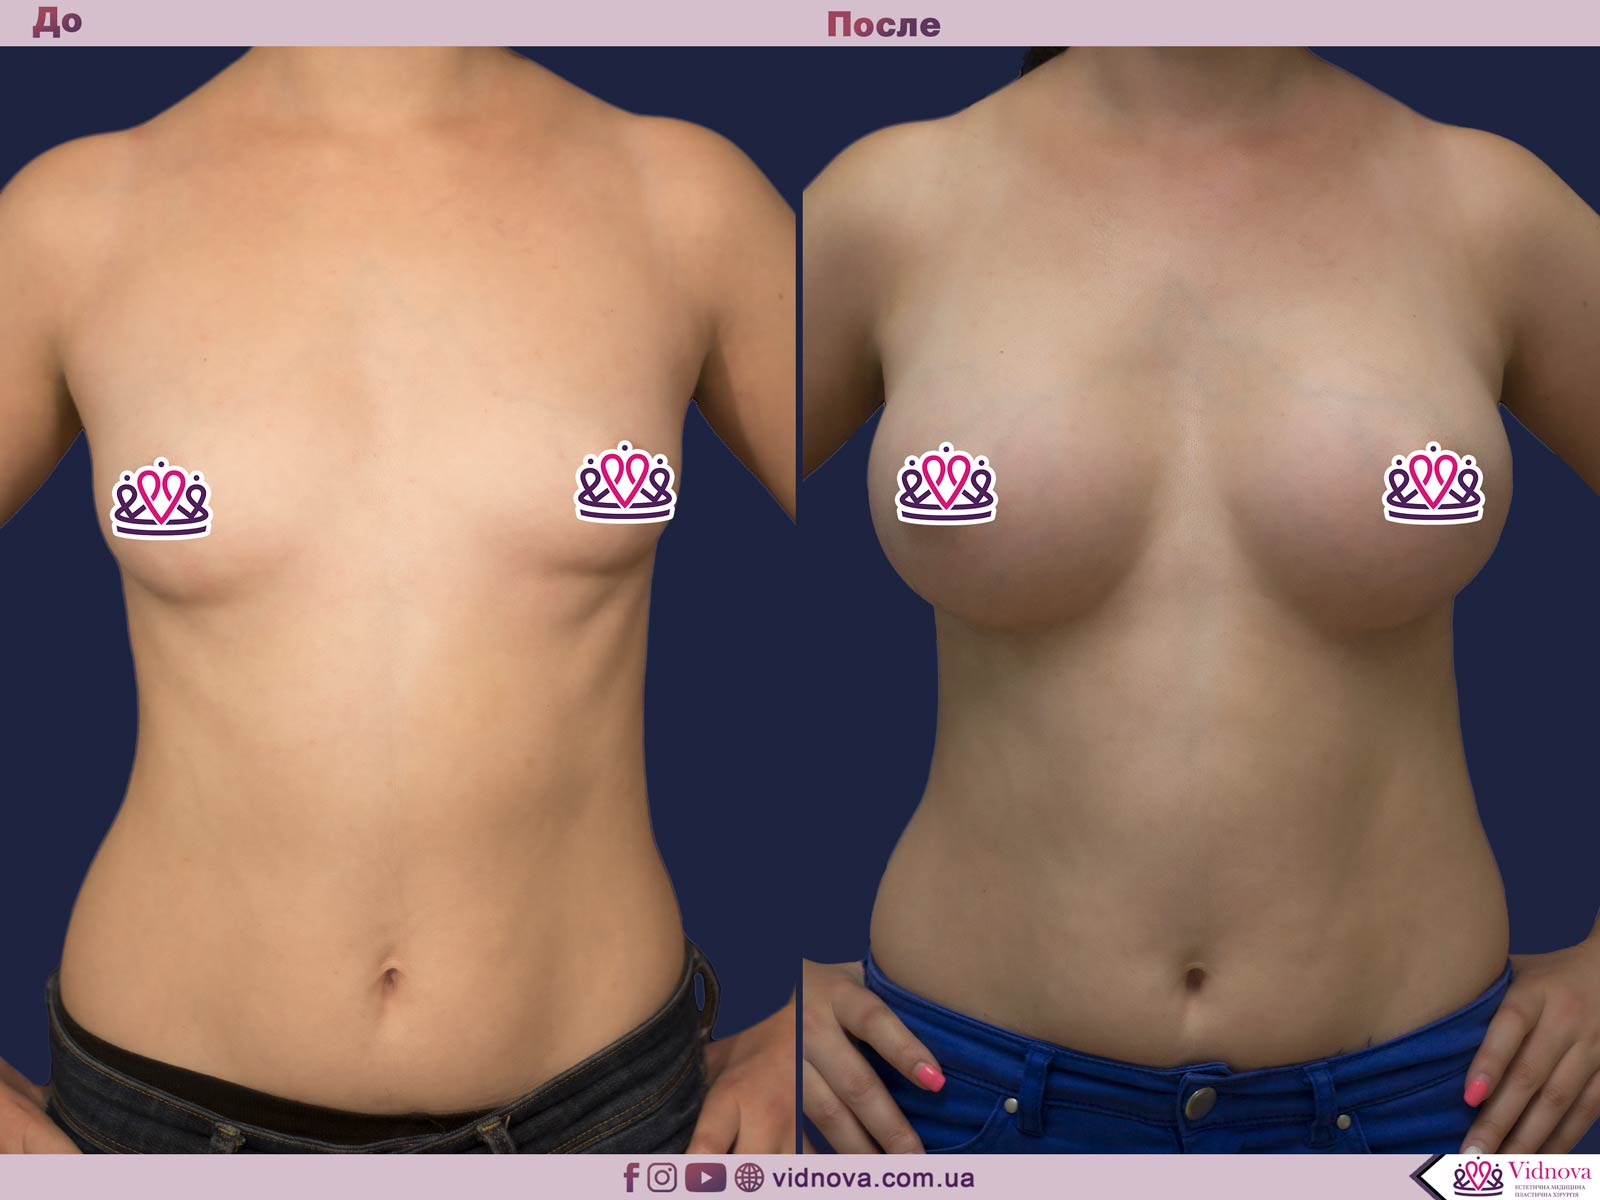 Увеличение груди: Фото ДО и ПОСЛЕ - Пример №78-1 - Клиника Vidnova